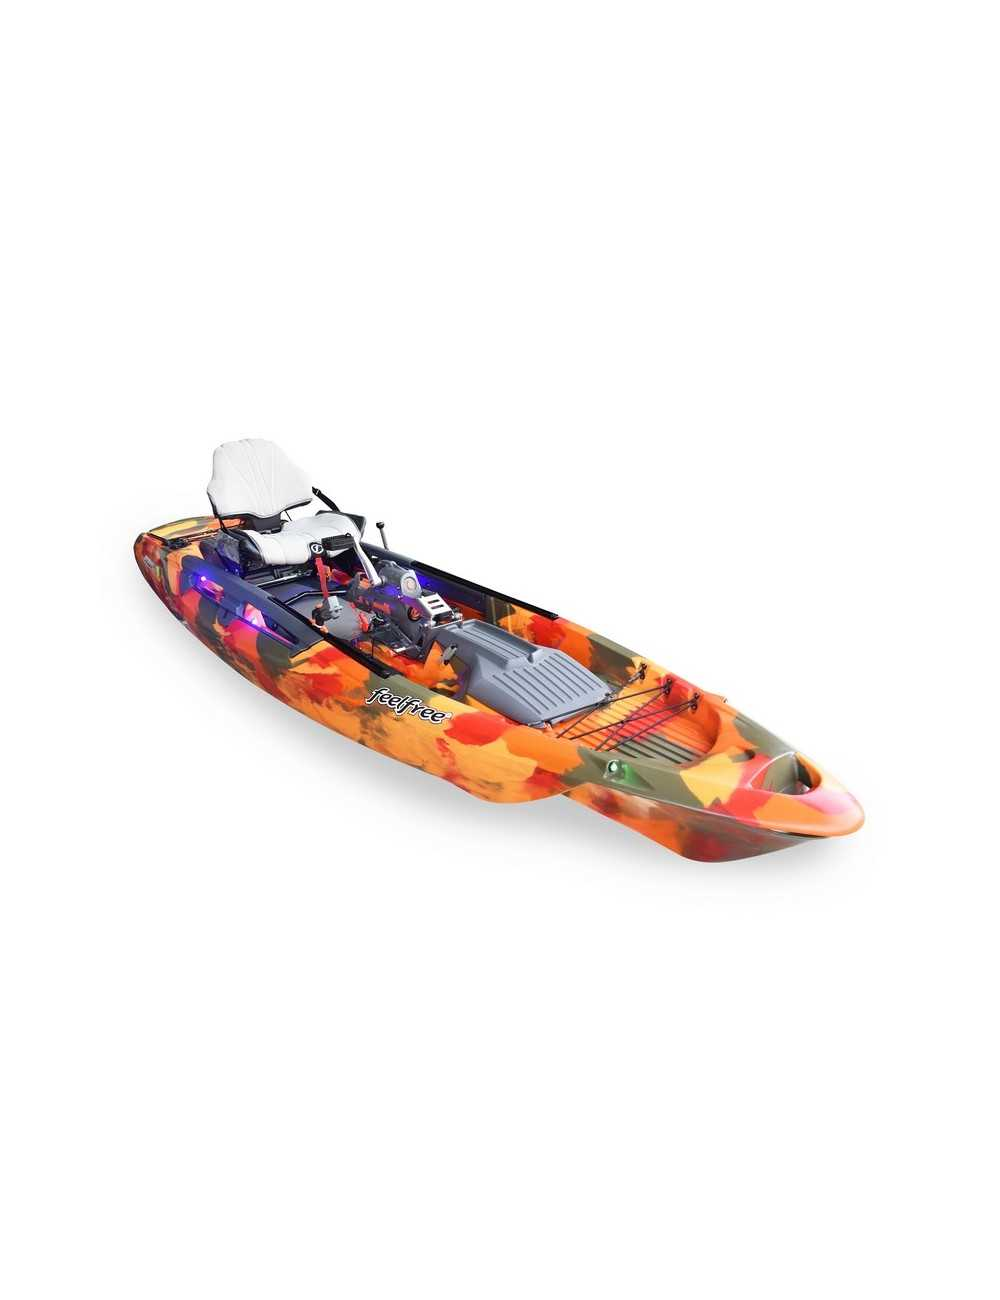 Kayak Dorado 125 Overdrive Powered de Feelfree Fire Camo